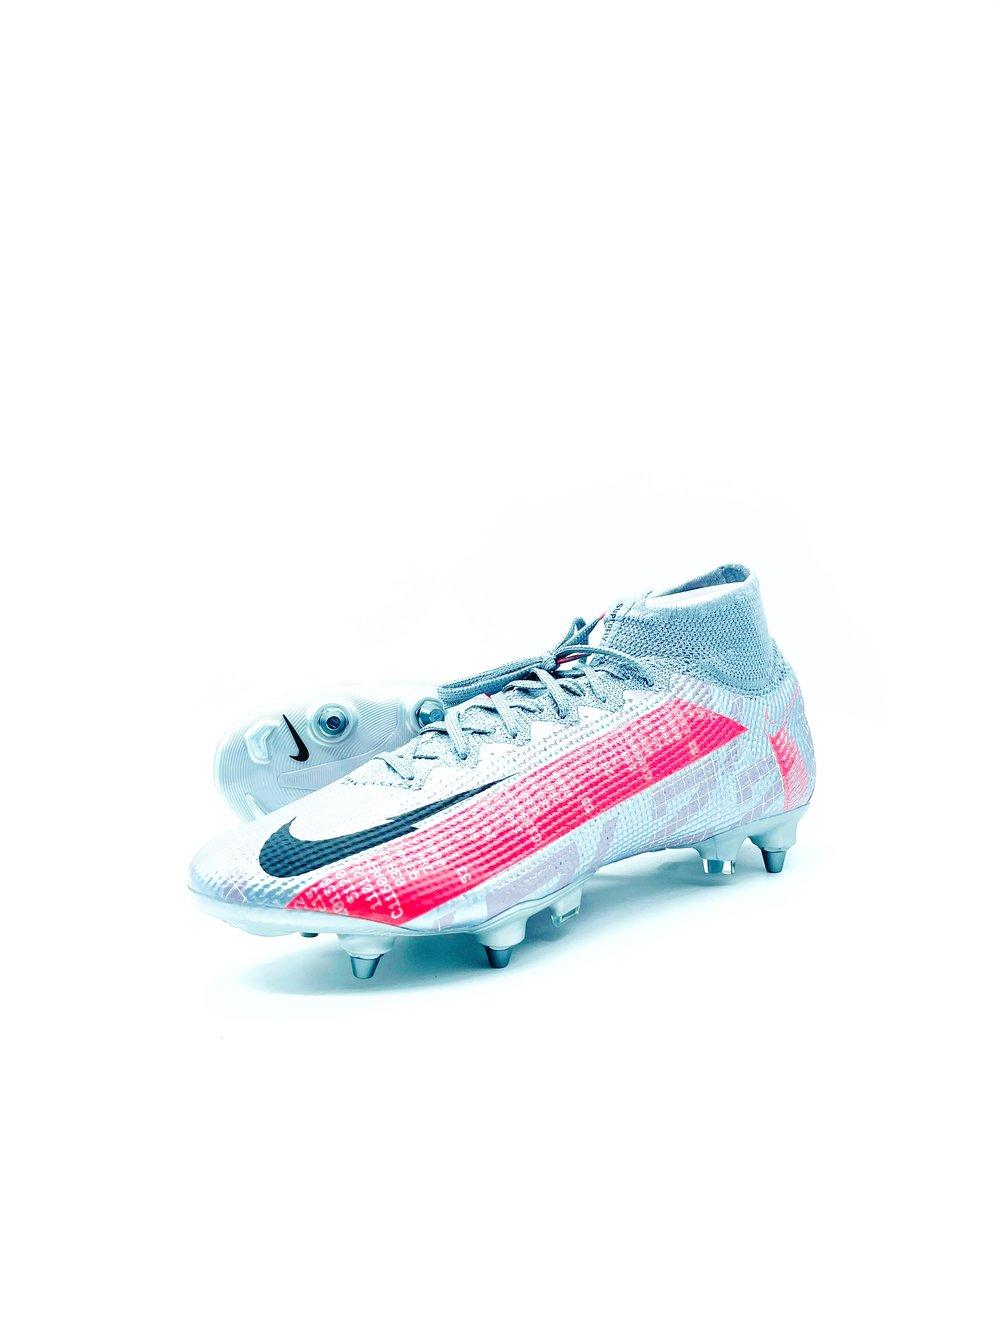 Image of Nike superfly 7 SG PRO